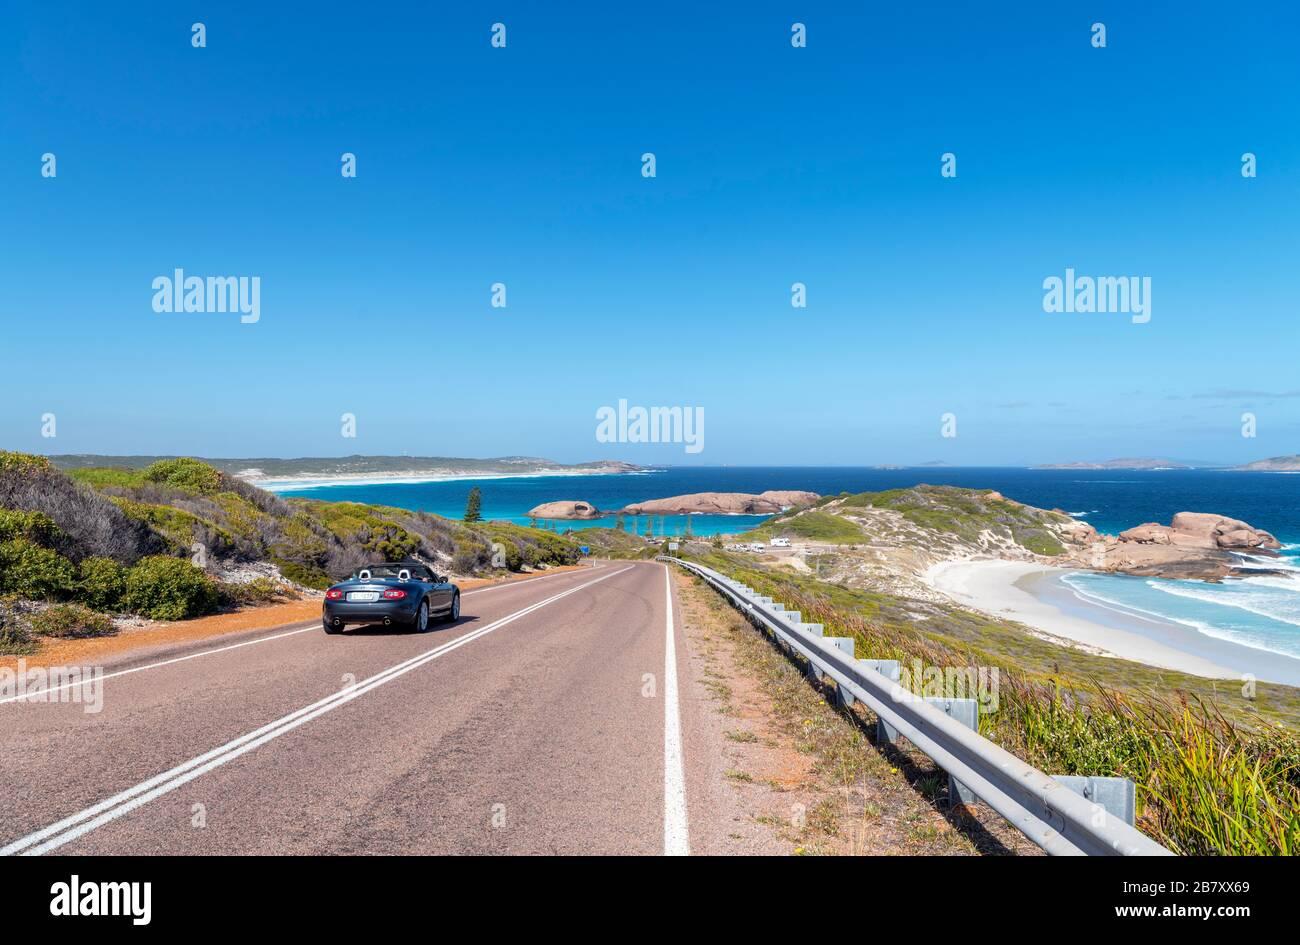 Car on the Great Ocean Drive near Twilight Beach, Esperance, Western Australia, Australia Stock Photo